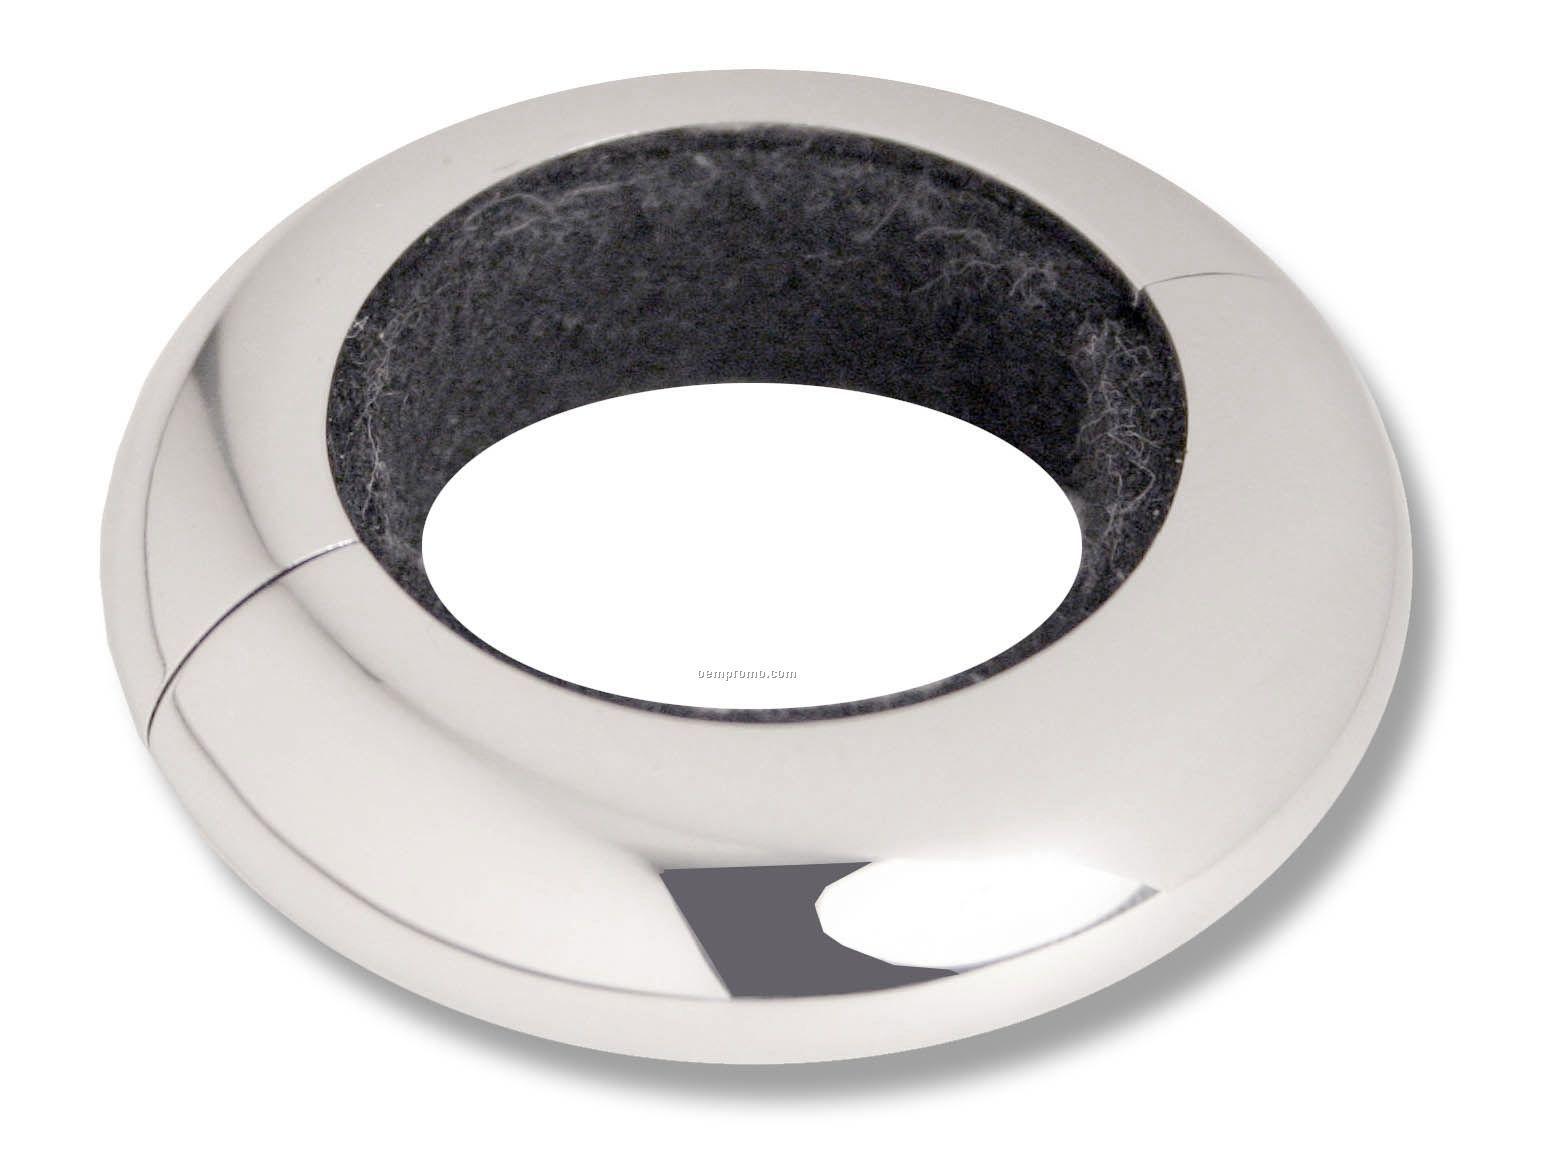 Magnetic Wine Bottle Drip Ring